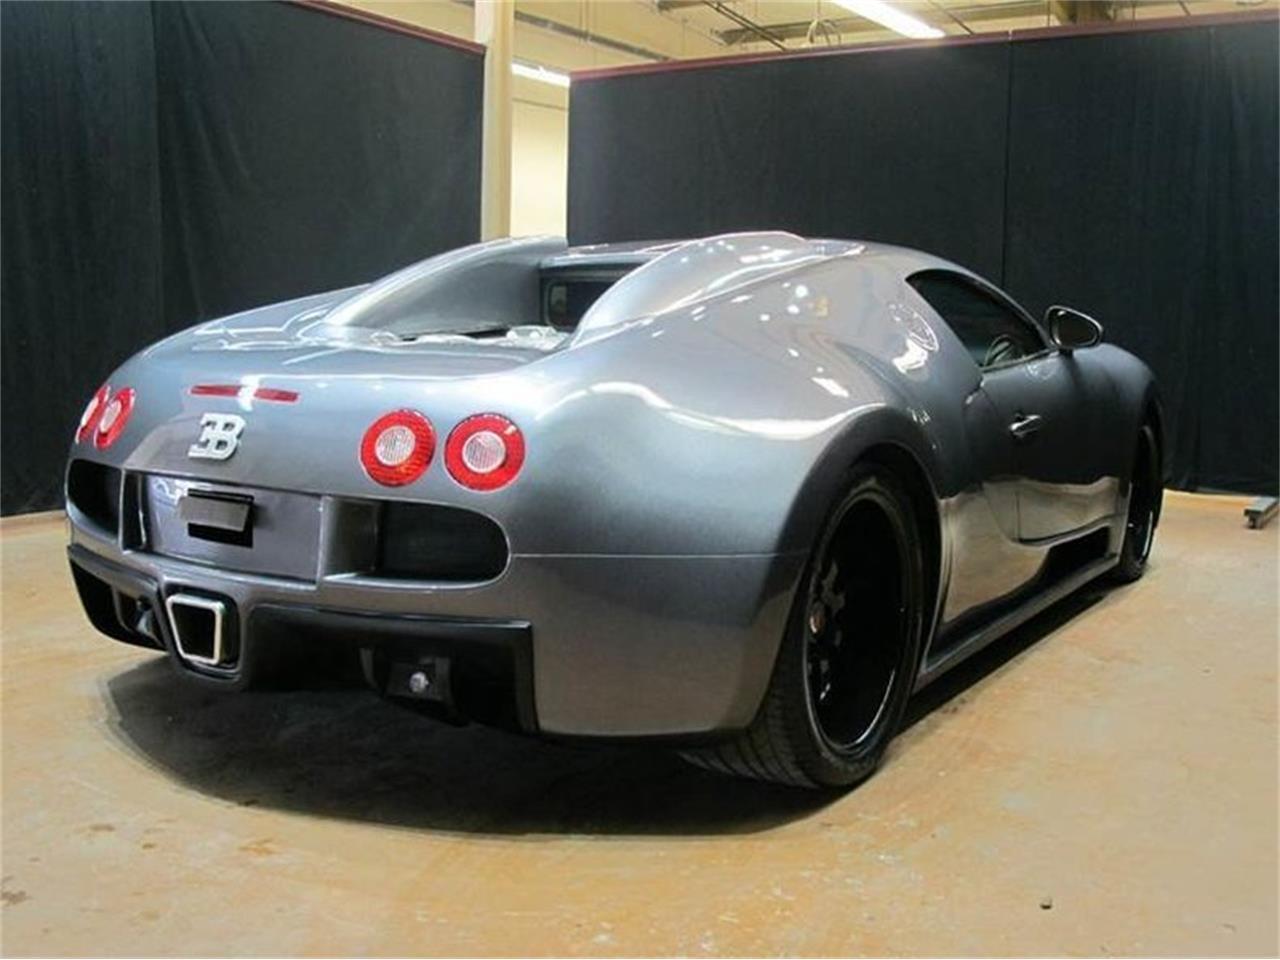 2008 Bugatti Veyron for Sale | ClassicCars.com | CC-873744